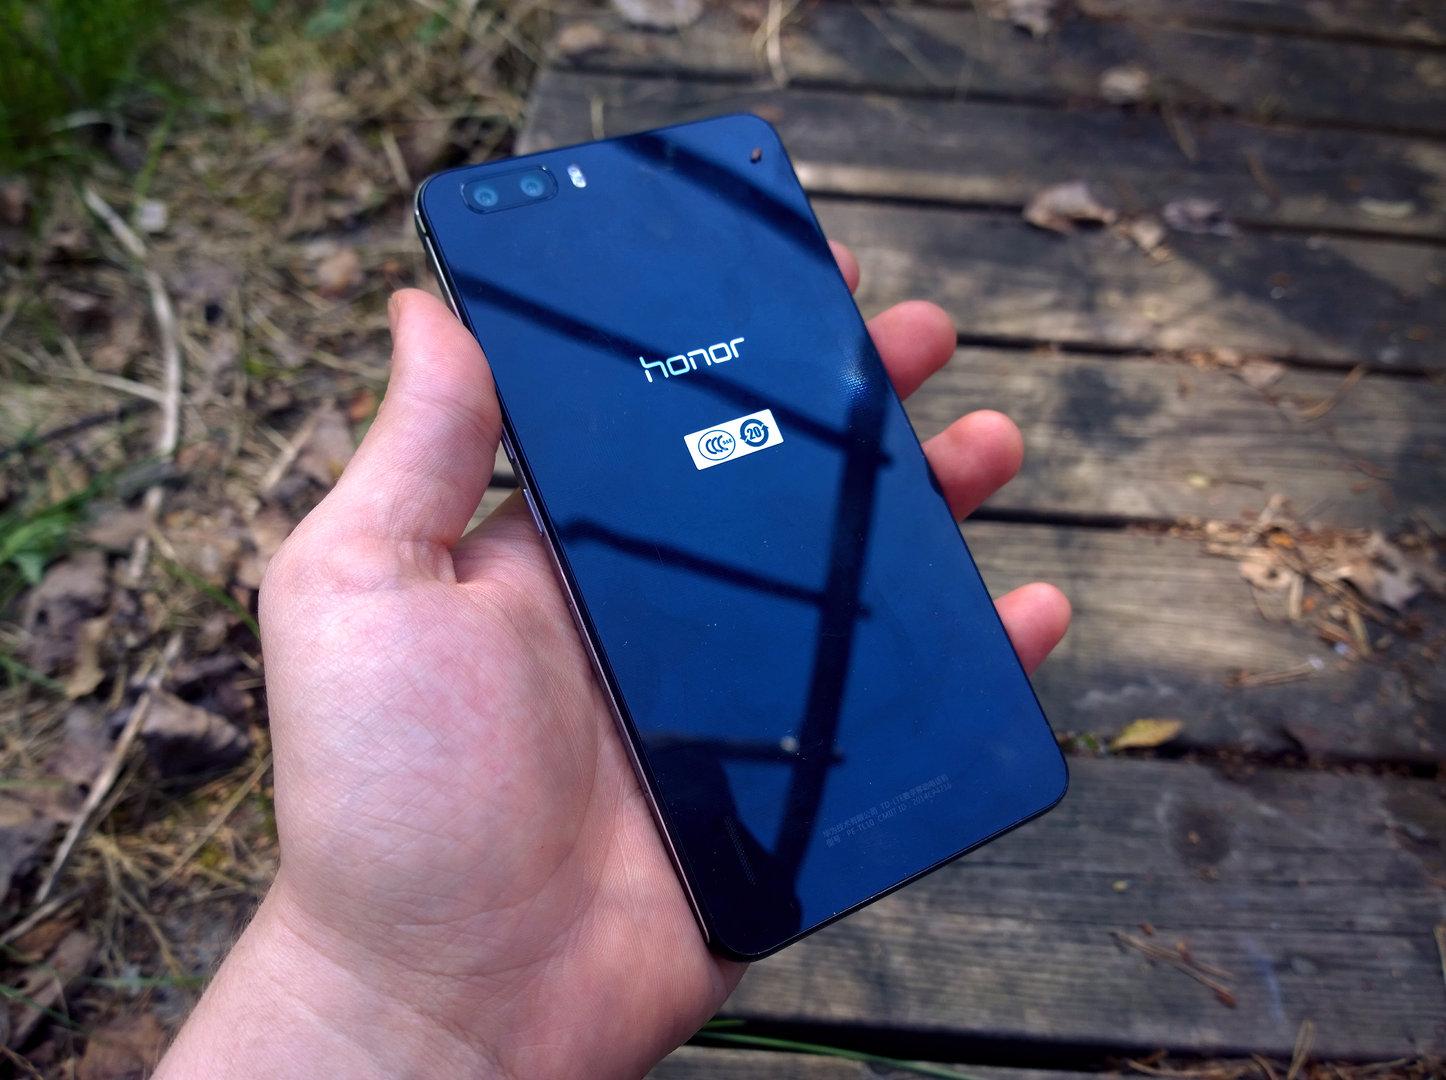 huawei honor 6 arvostelu Nokia